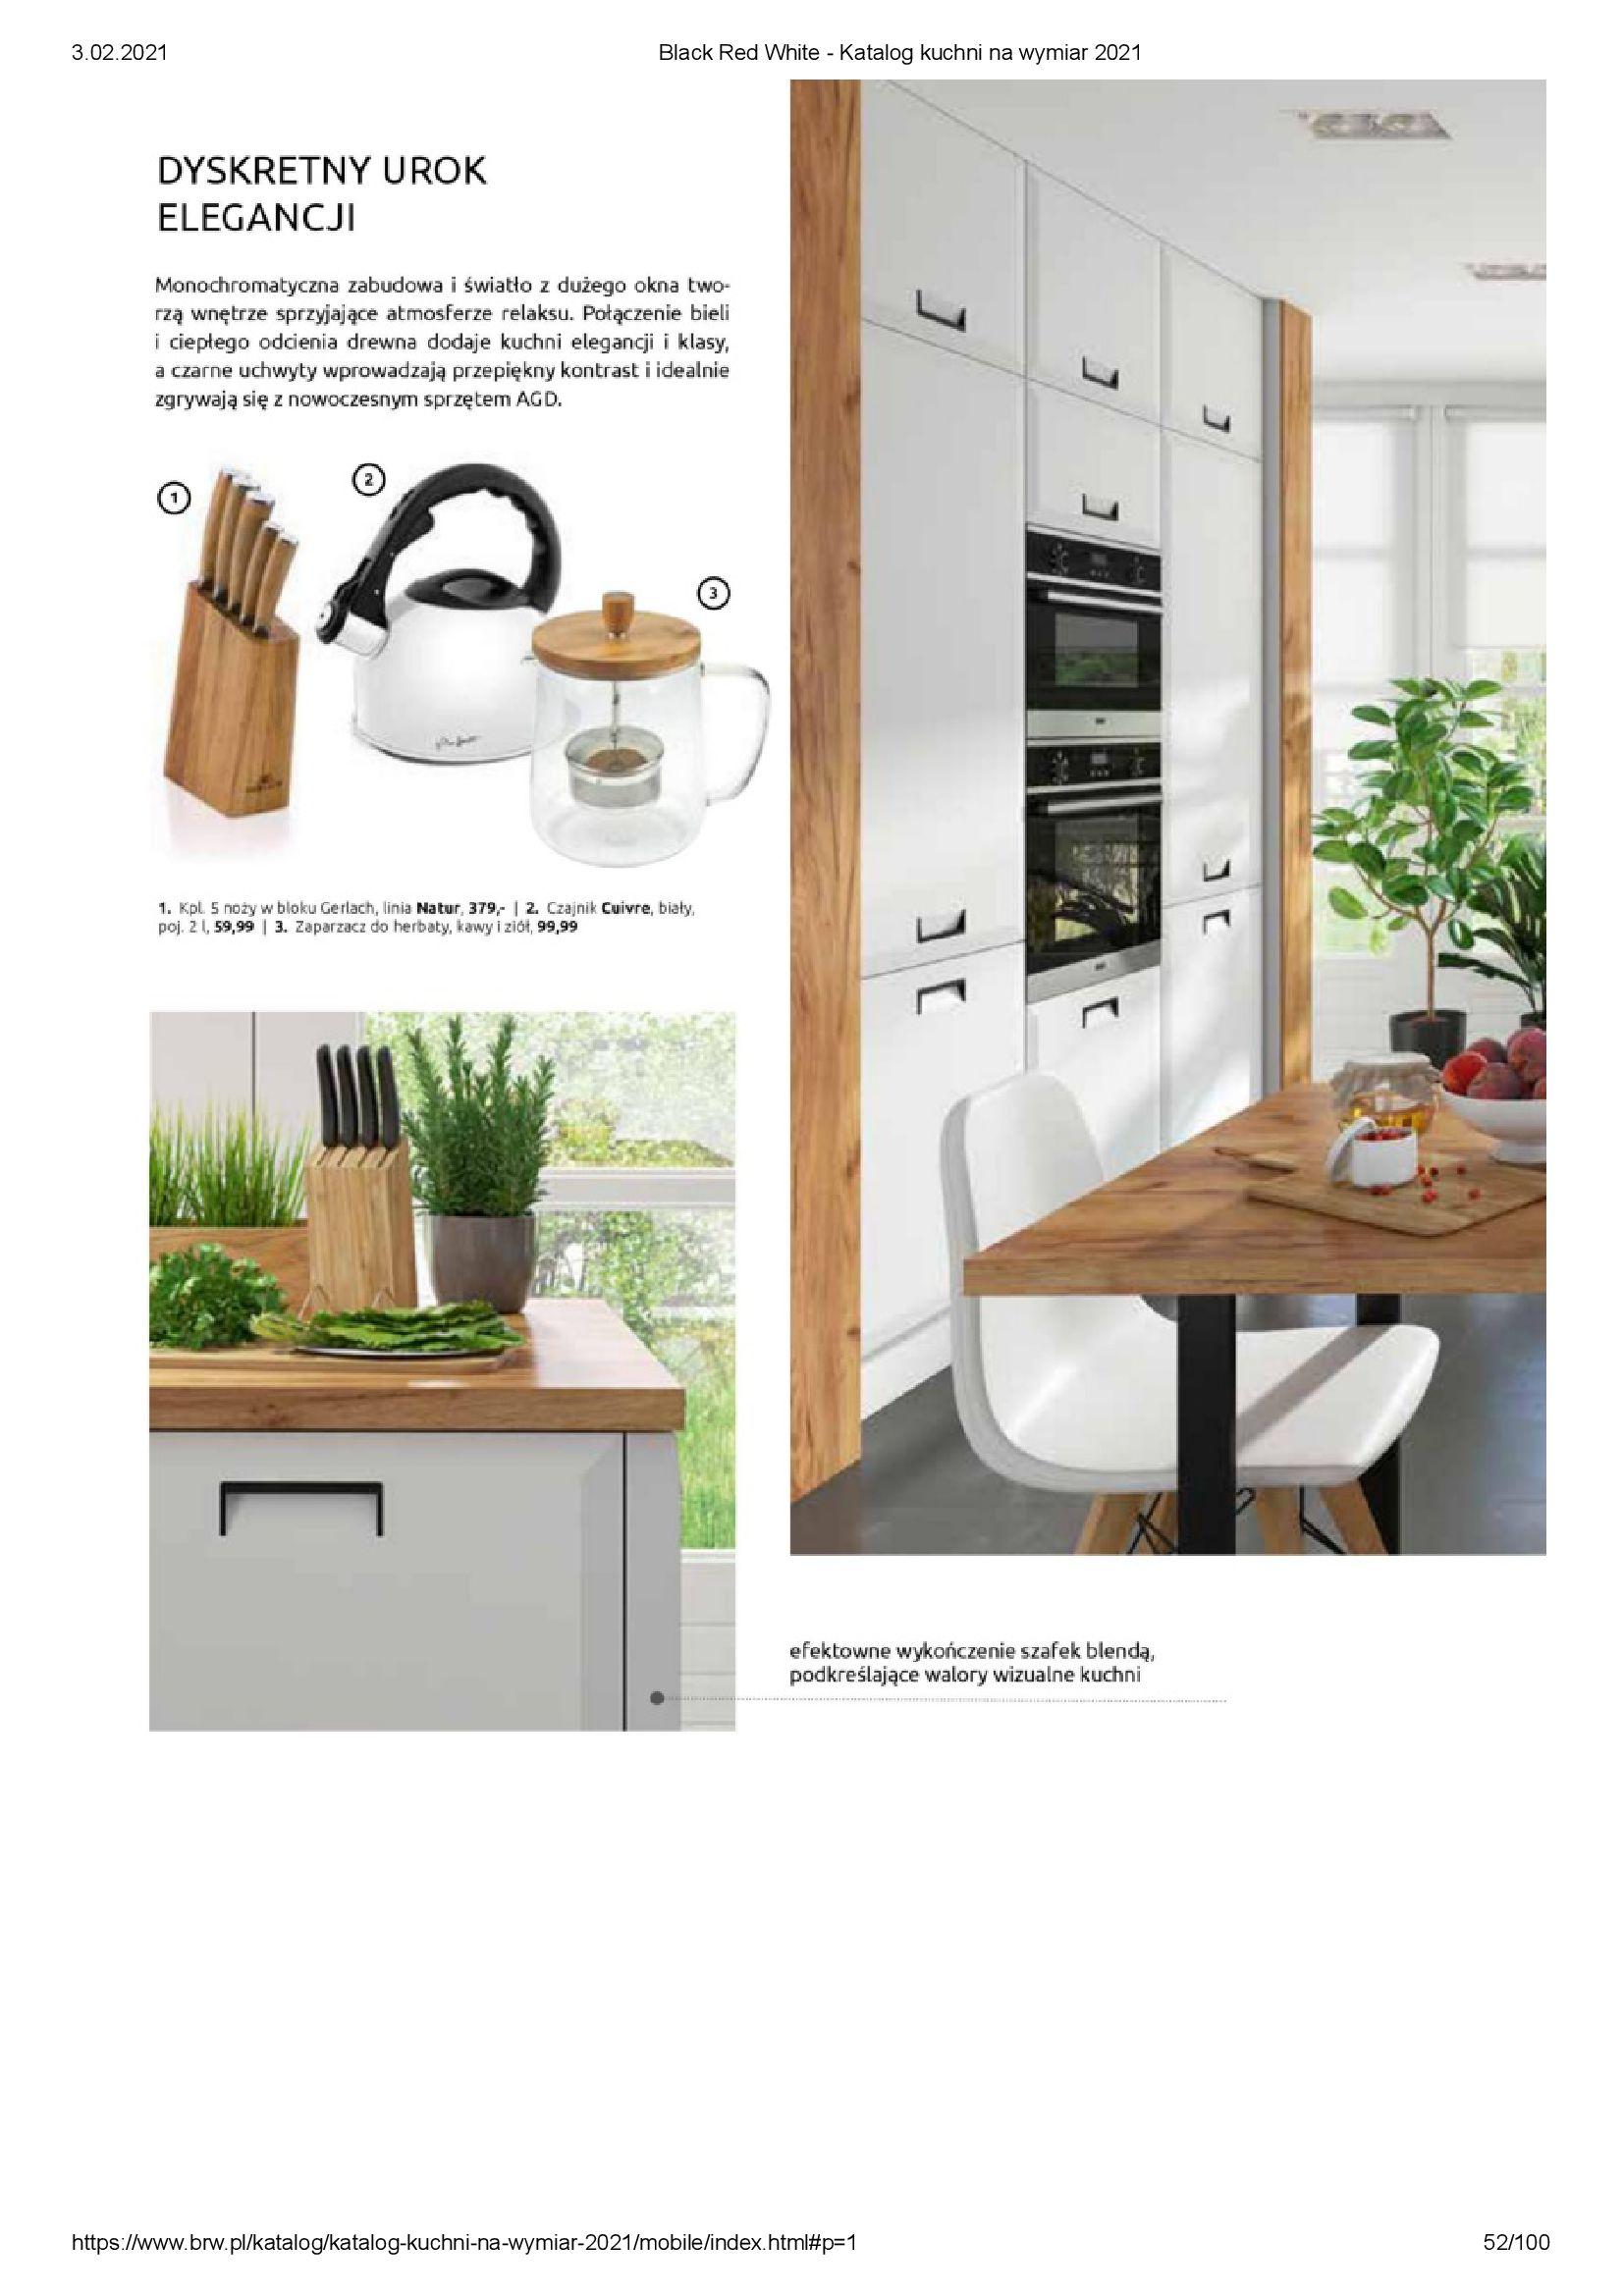 Gazetka Black Red White: Katalog - Kuchnie na wymiar Senso Kitchens 2021 2021-01-01 page-52